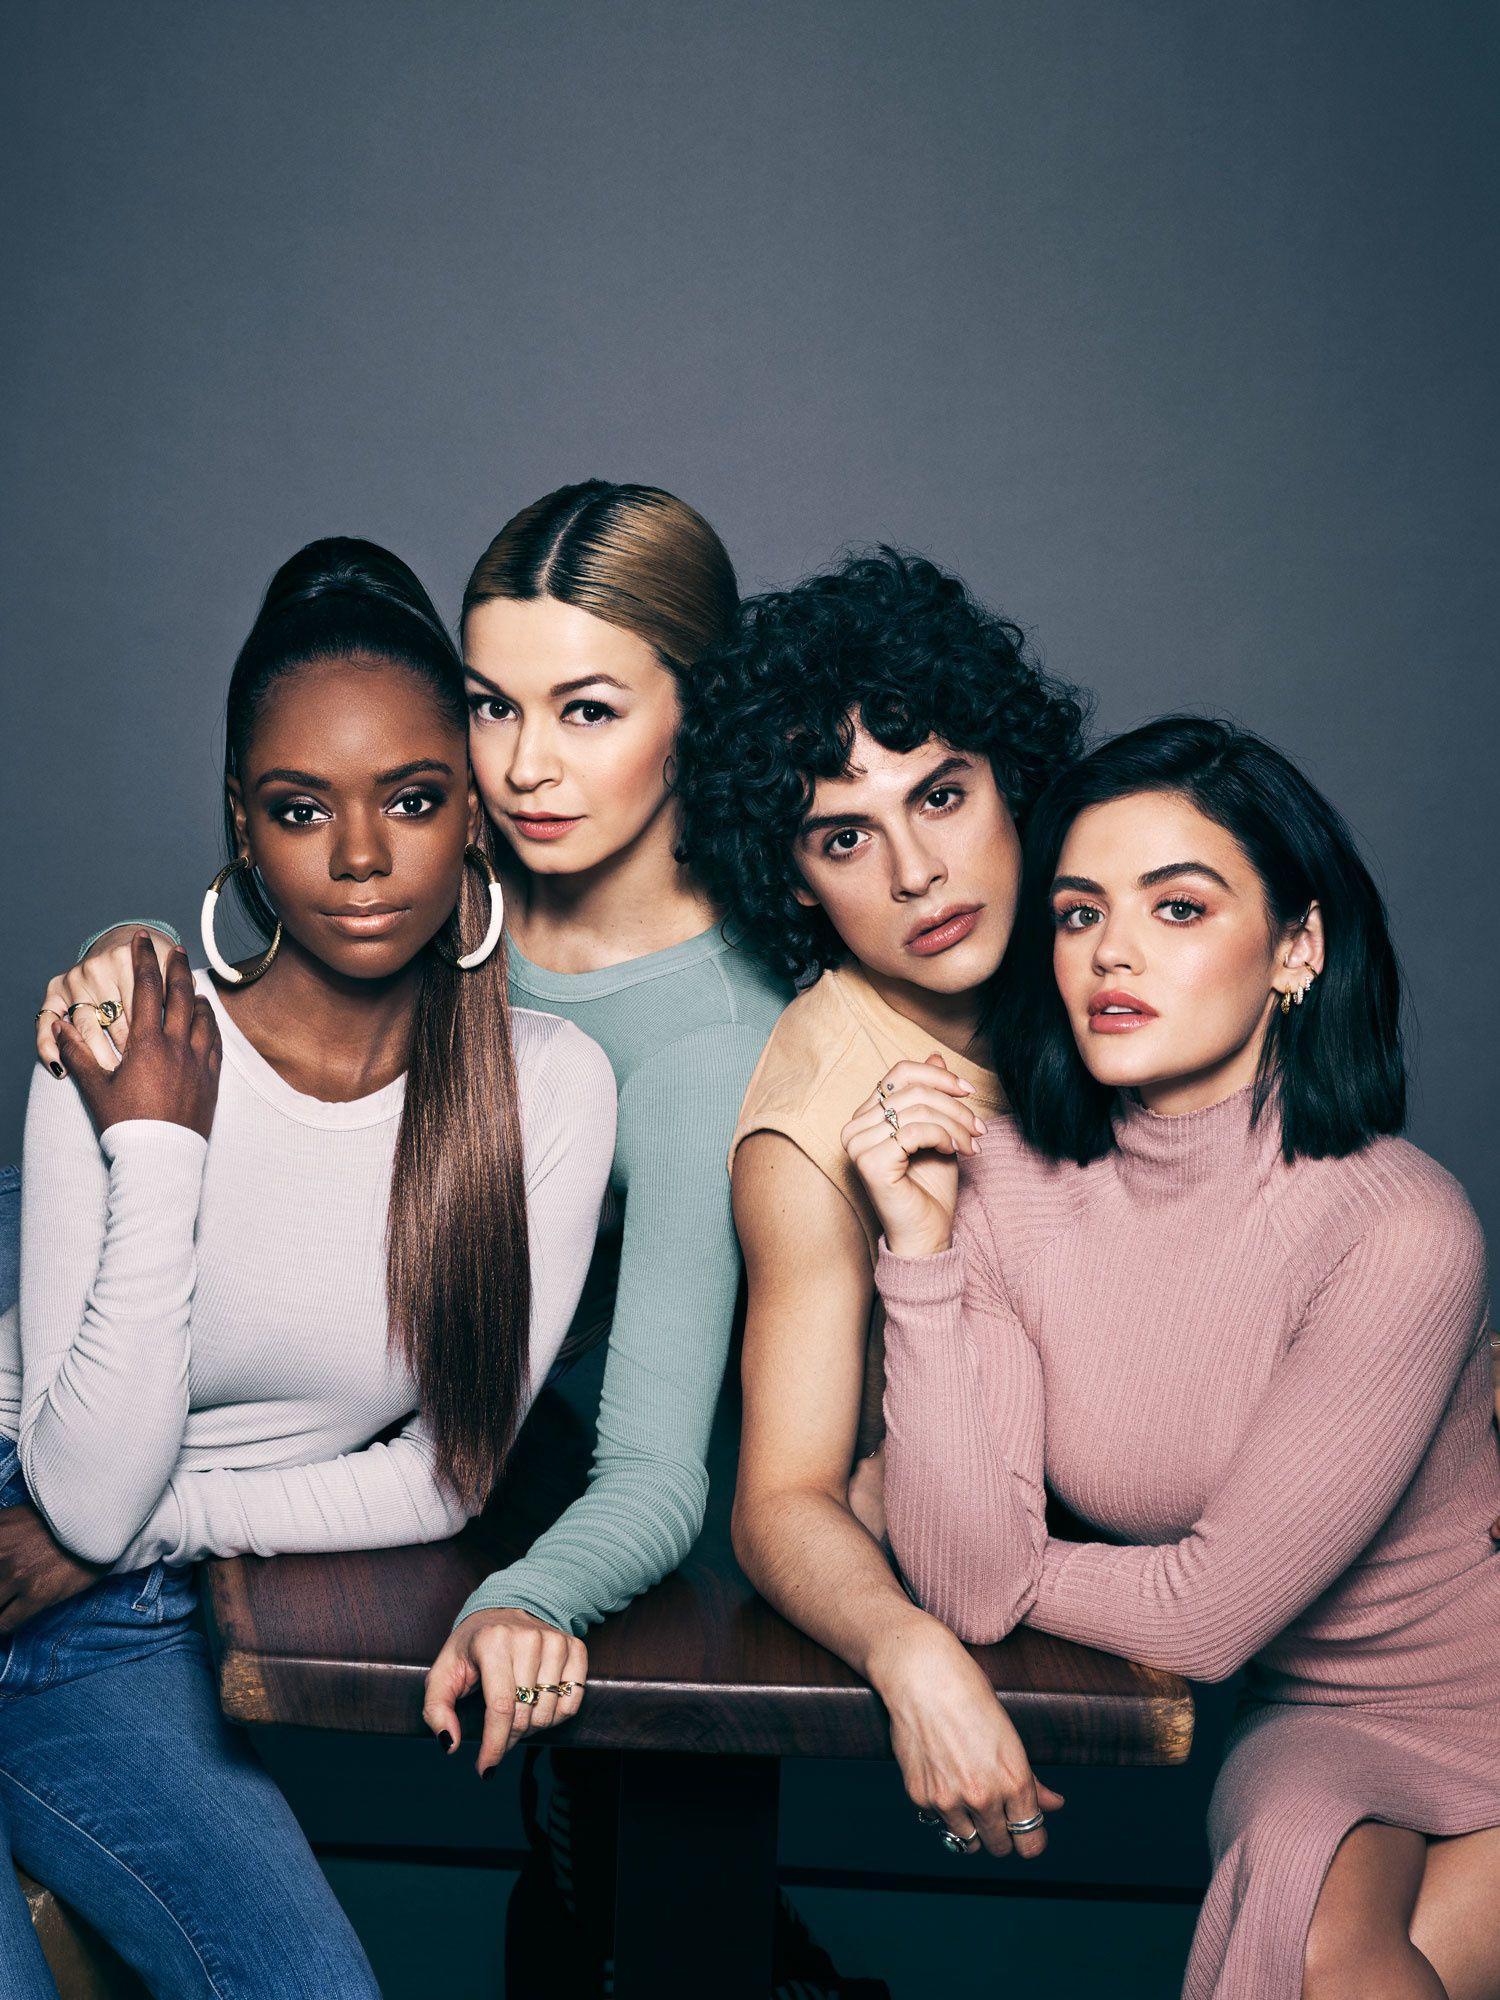 The close-knit cast of TV show Katy Keene.